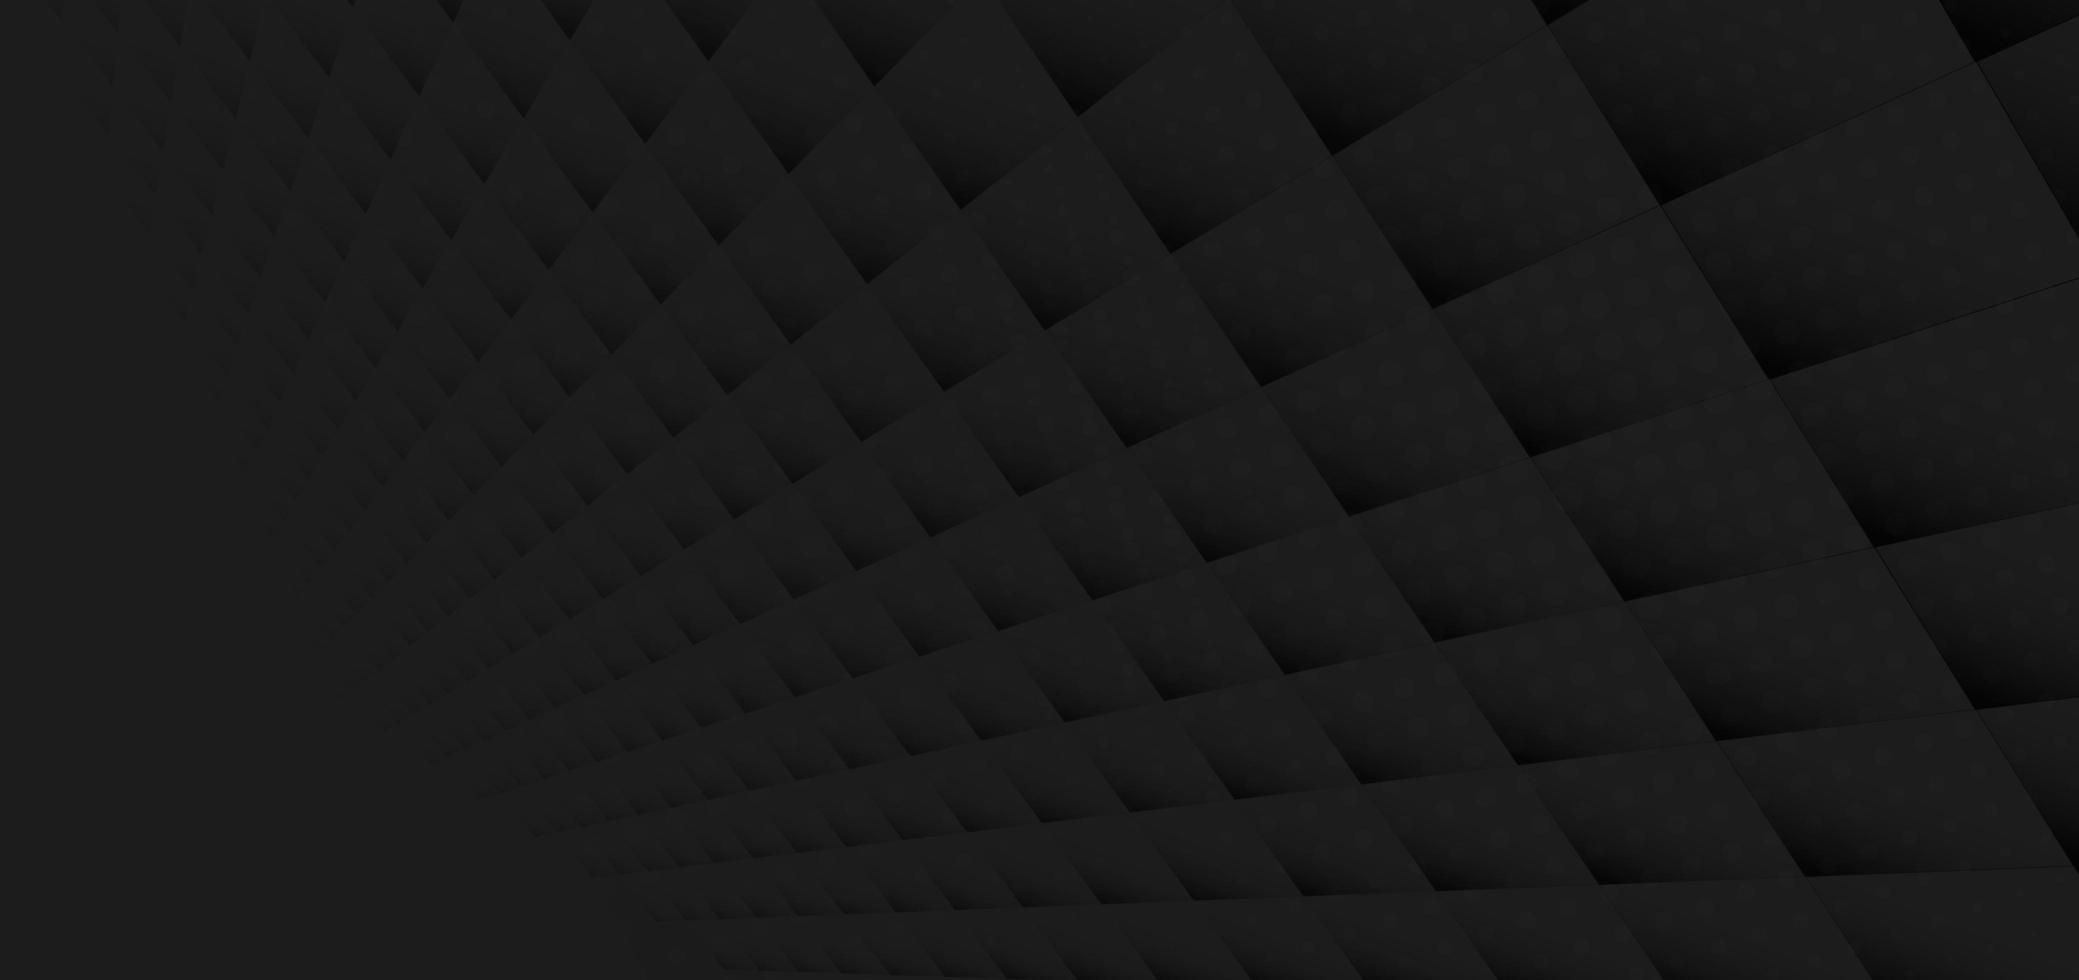 abstraktes geometrisches schwarzes Quadratmuster vektor